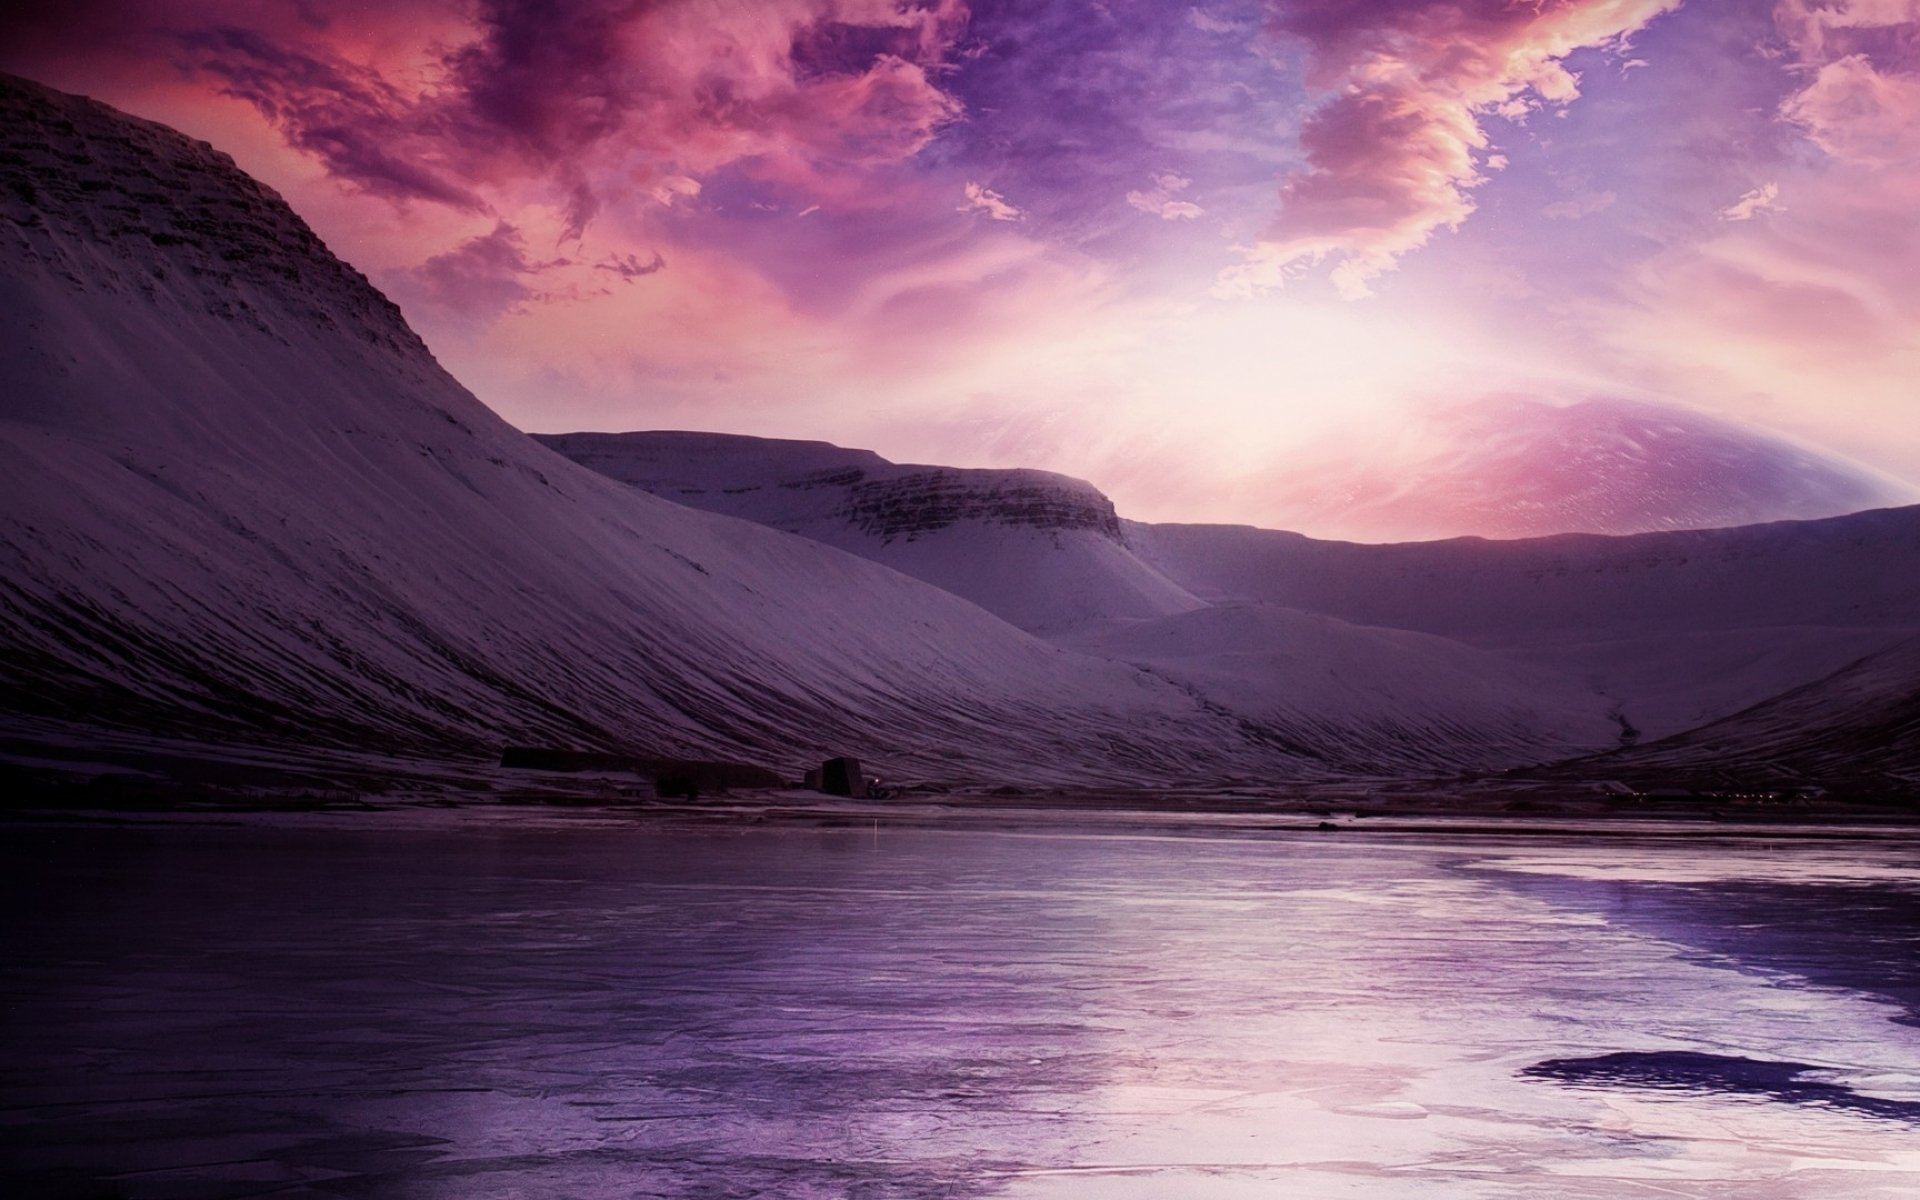 Beautiful Winter Sky Over Frozen Lake Fondo De Pantalla Hd